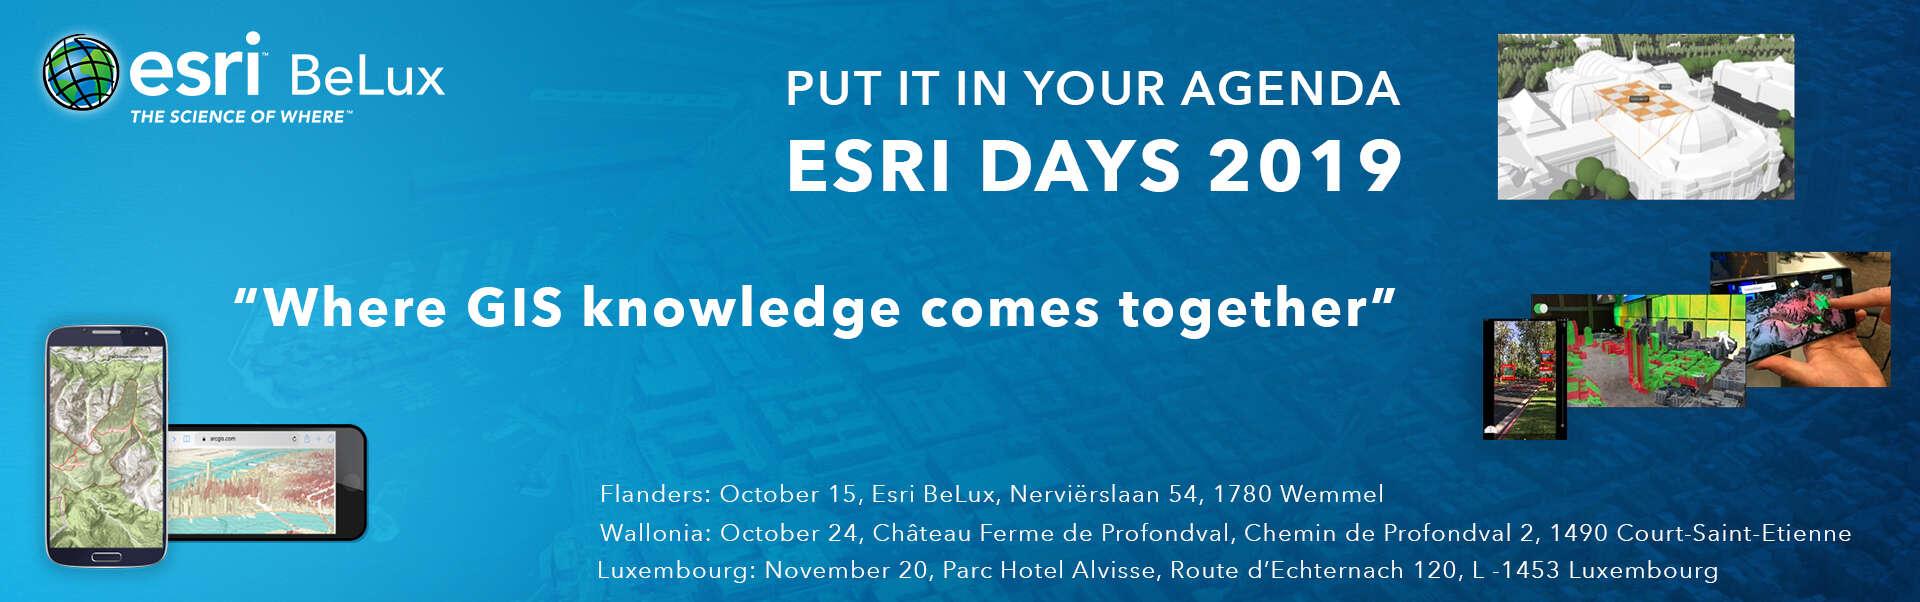 banner Esri Days 2019